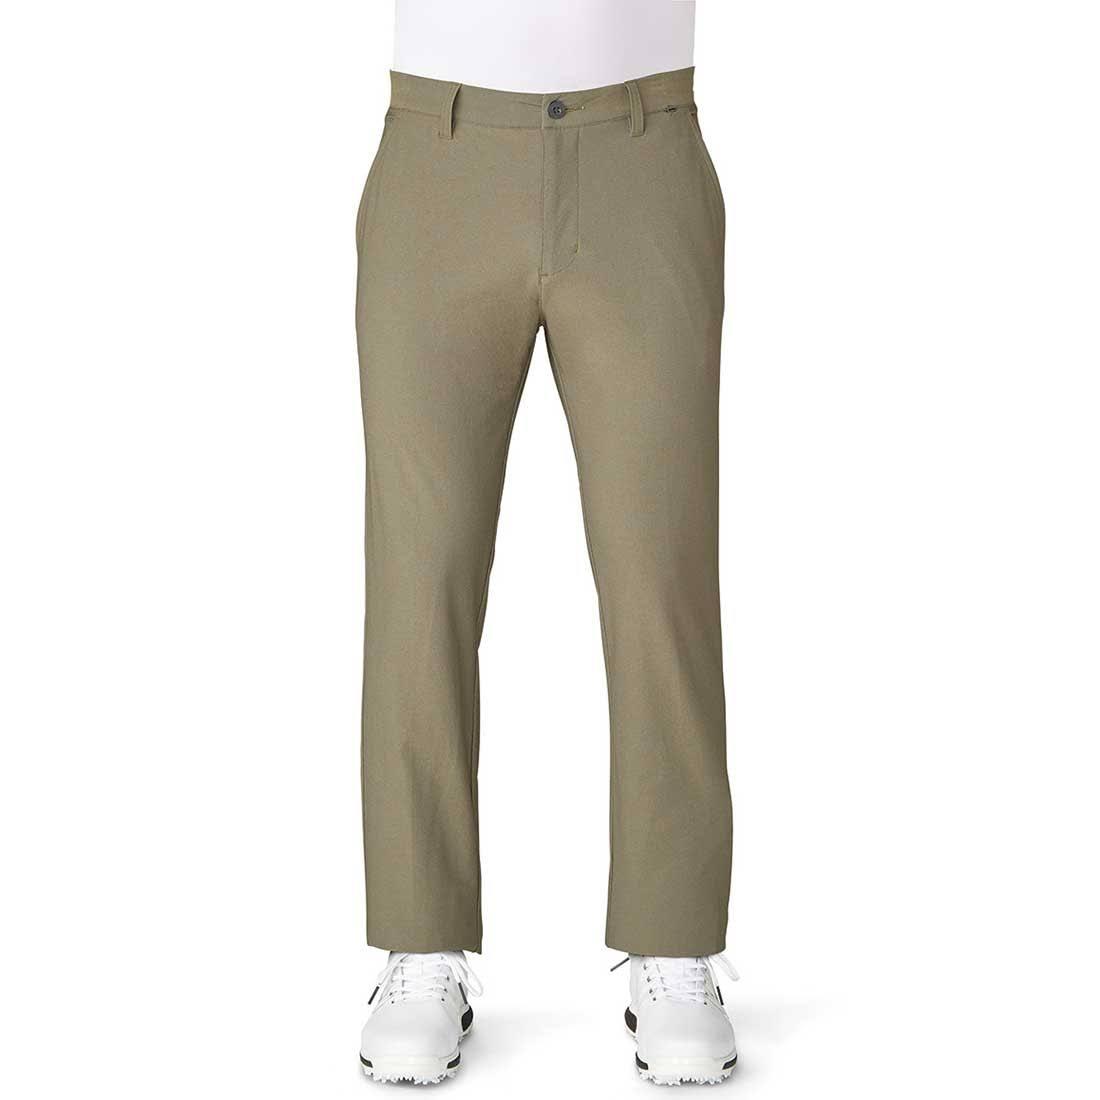 Twill Adidas 32x34 Marrón Crosshatch Pants Caqui Ultimate365 Táctil vwTZwqp5